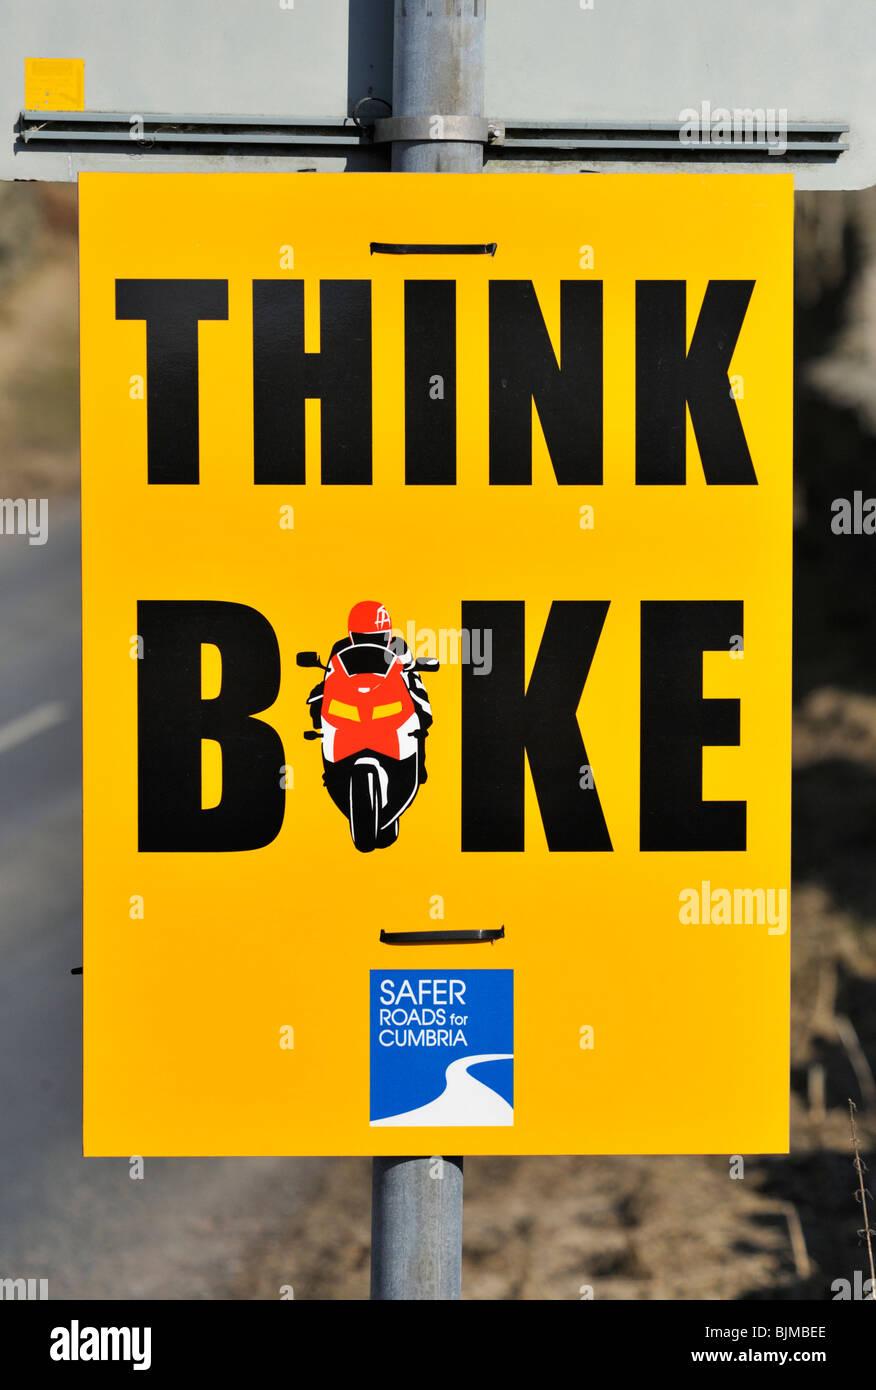 think-bike-safer-roads-for-cumbria-poster-cumbria-england-united-kingdom-BJMBEE.jpg